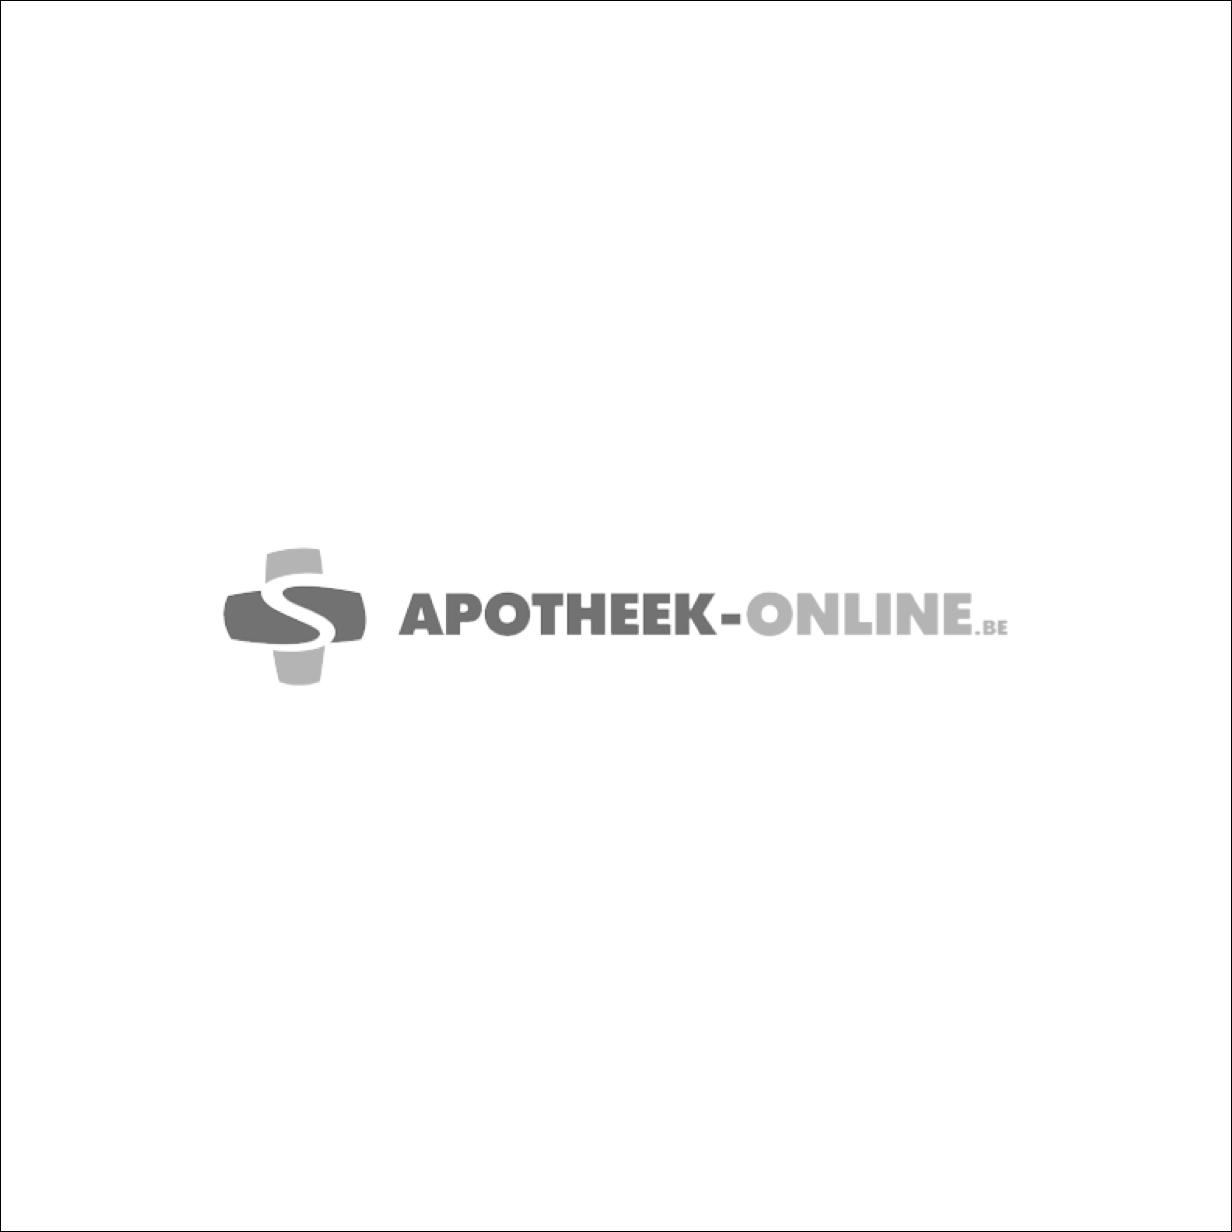 TENA SLIP MAXI MEDIUM 24 710924 VERV.2687168